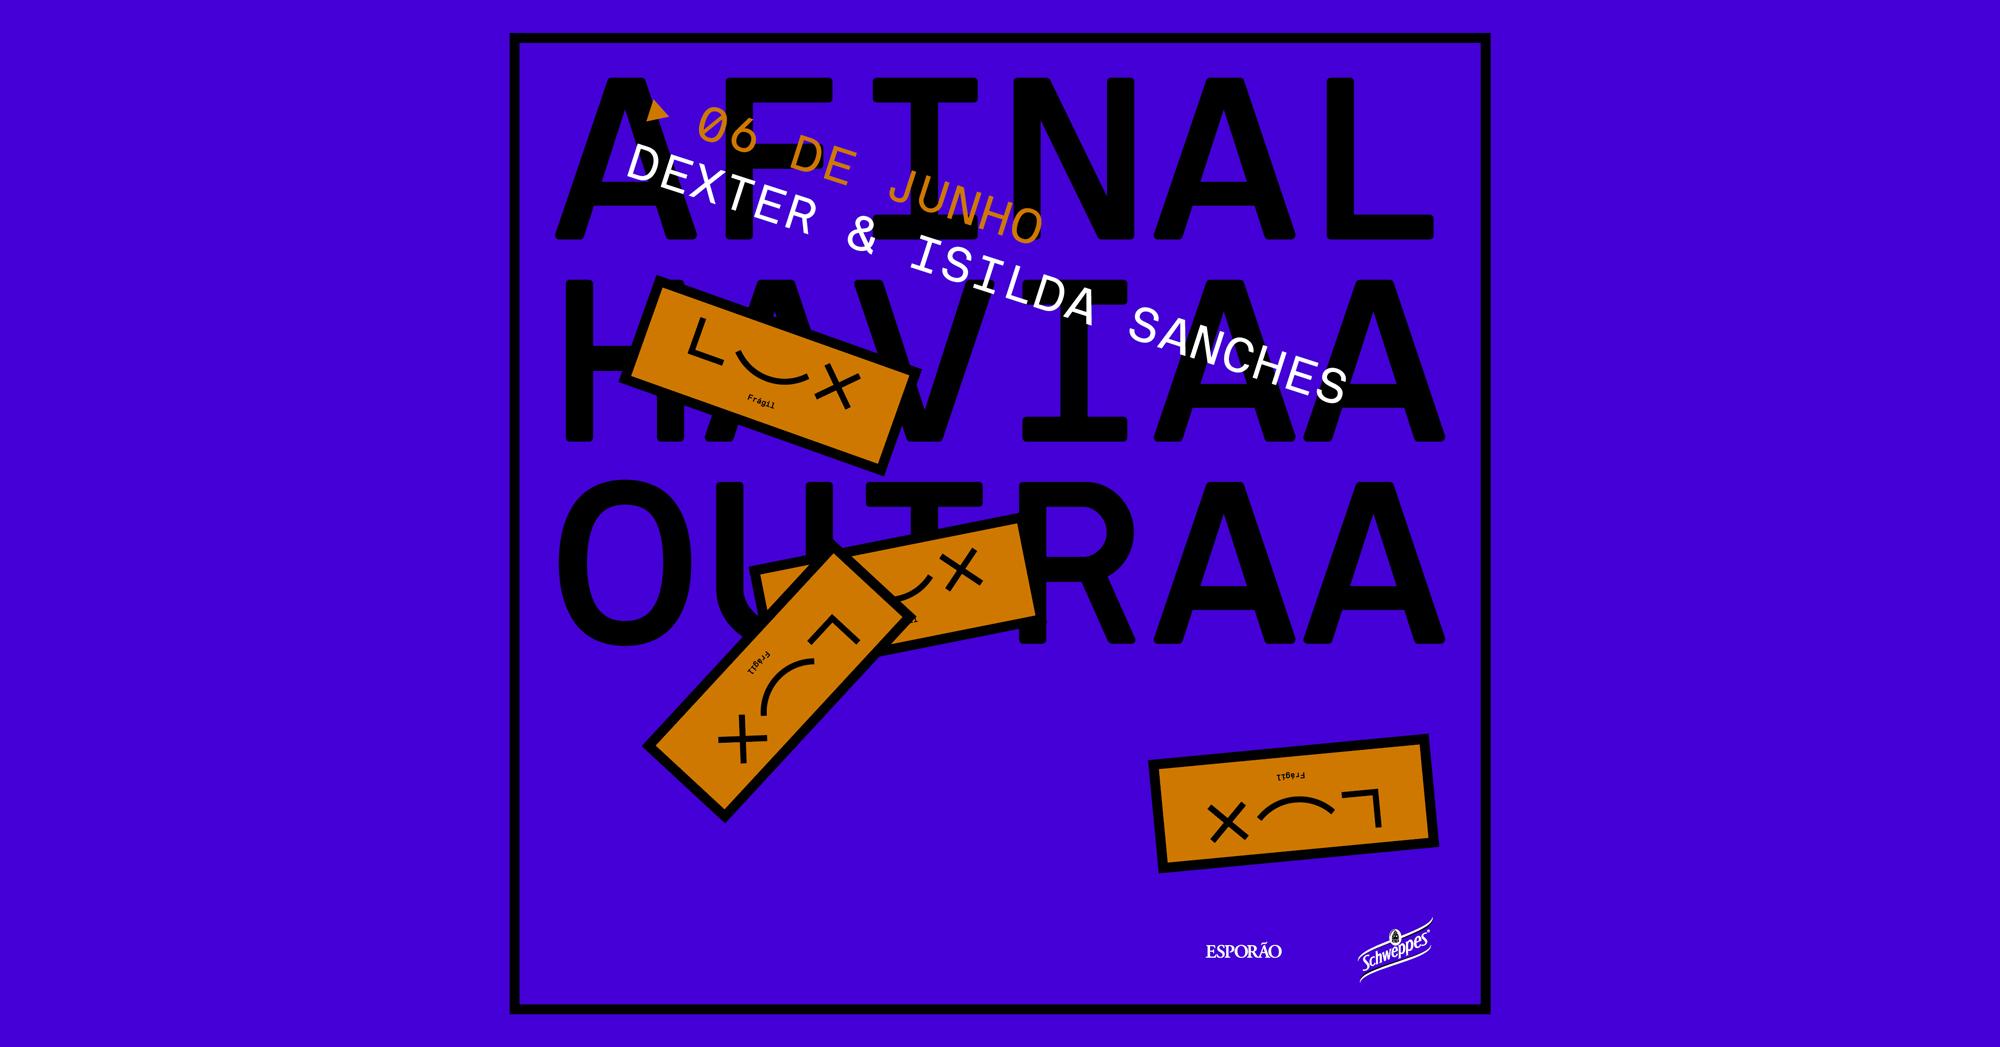 Afinal Havia Outra com Dexter & Isilda Sanches